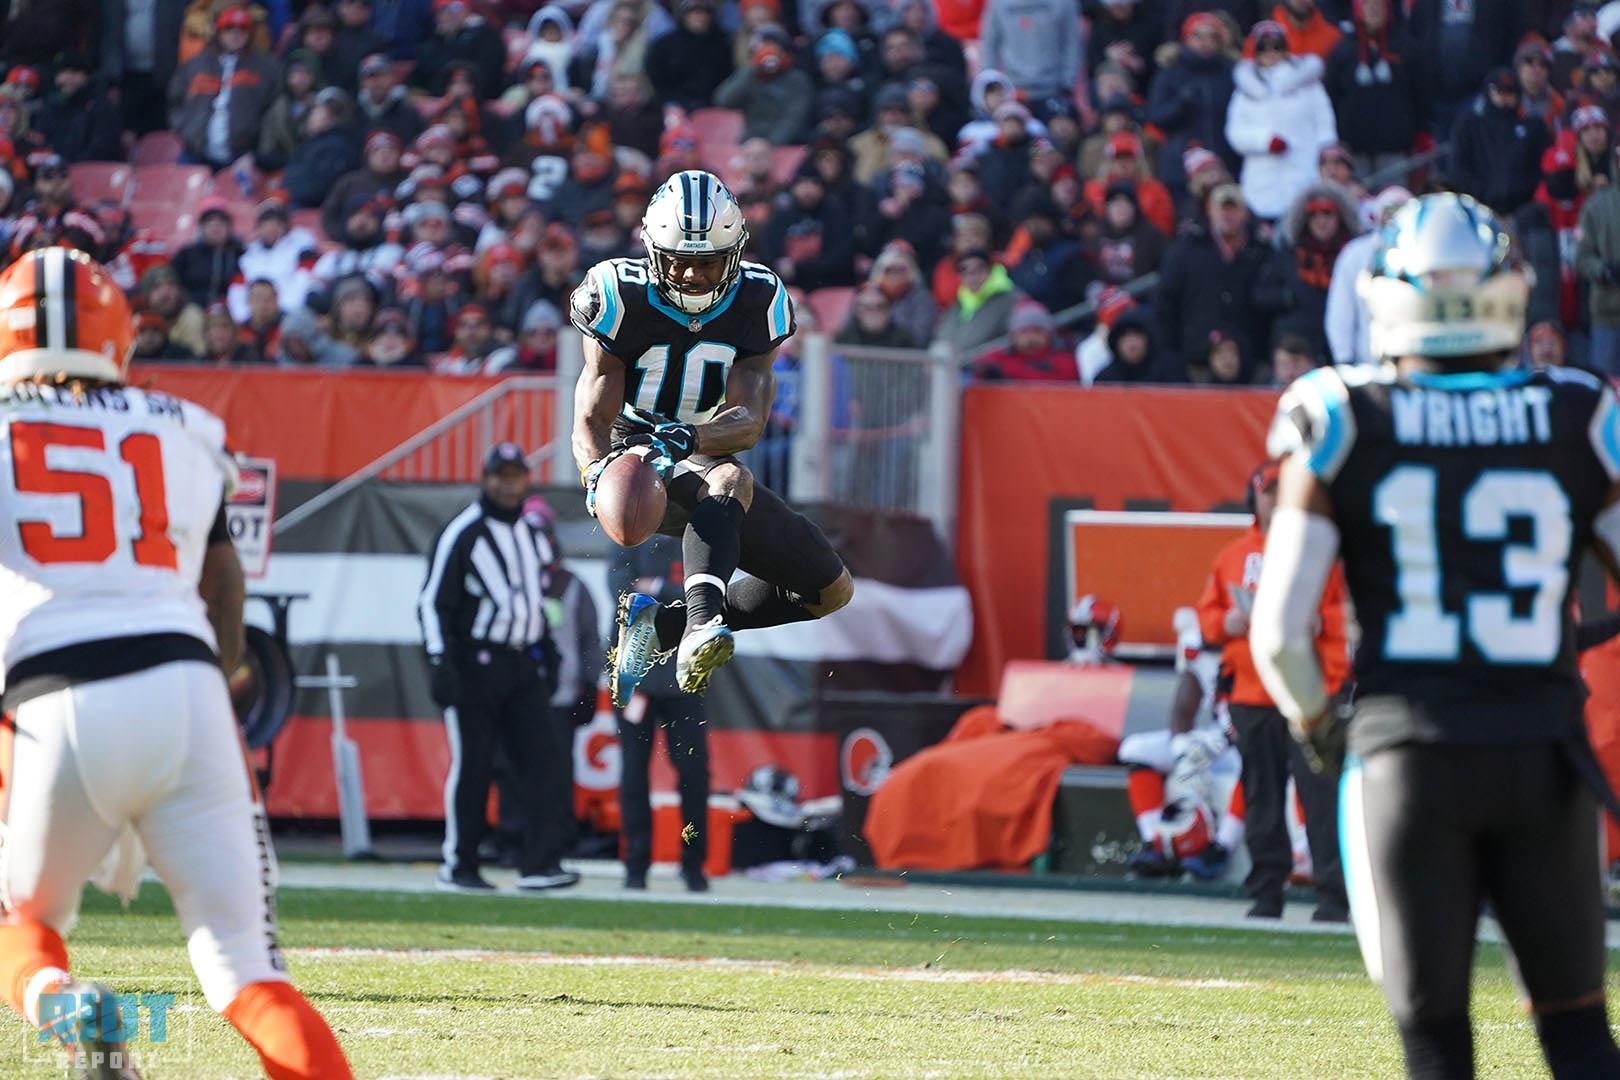 Photo Gallery: Carolina Panthers vs Cleveland Browns